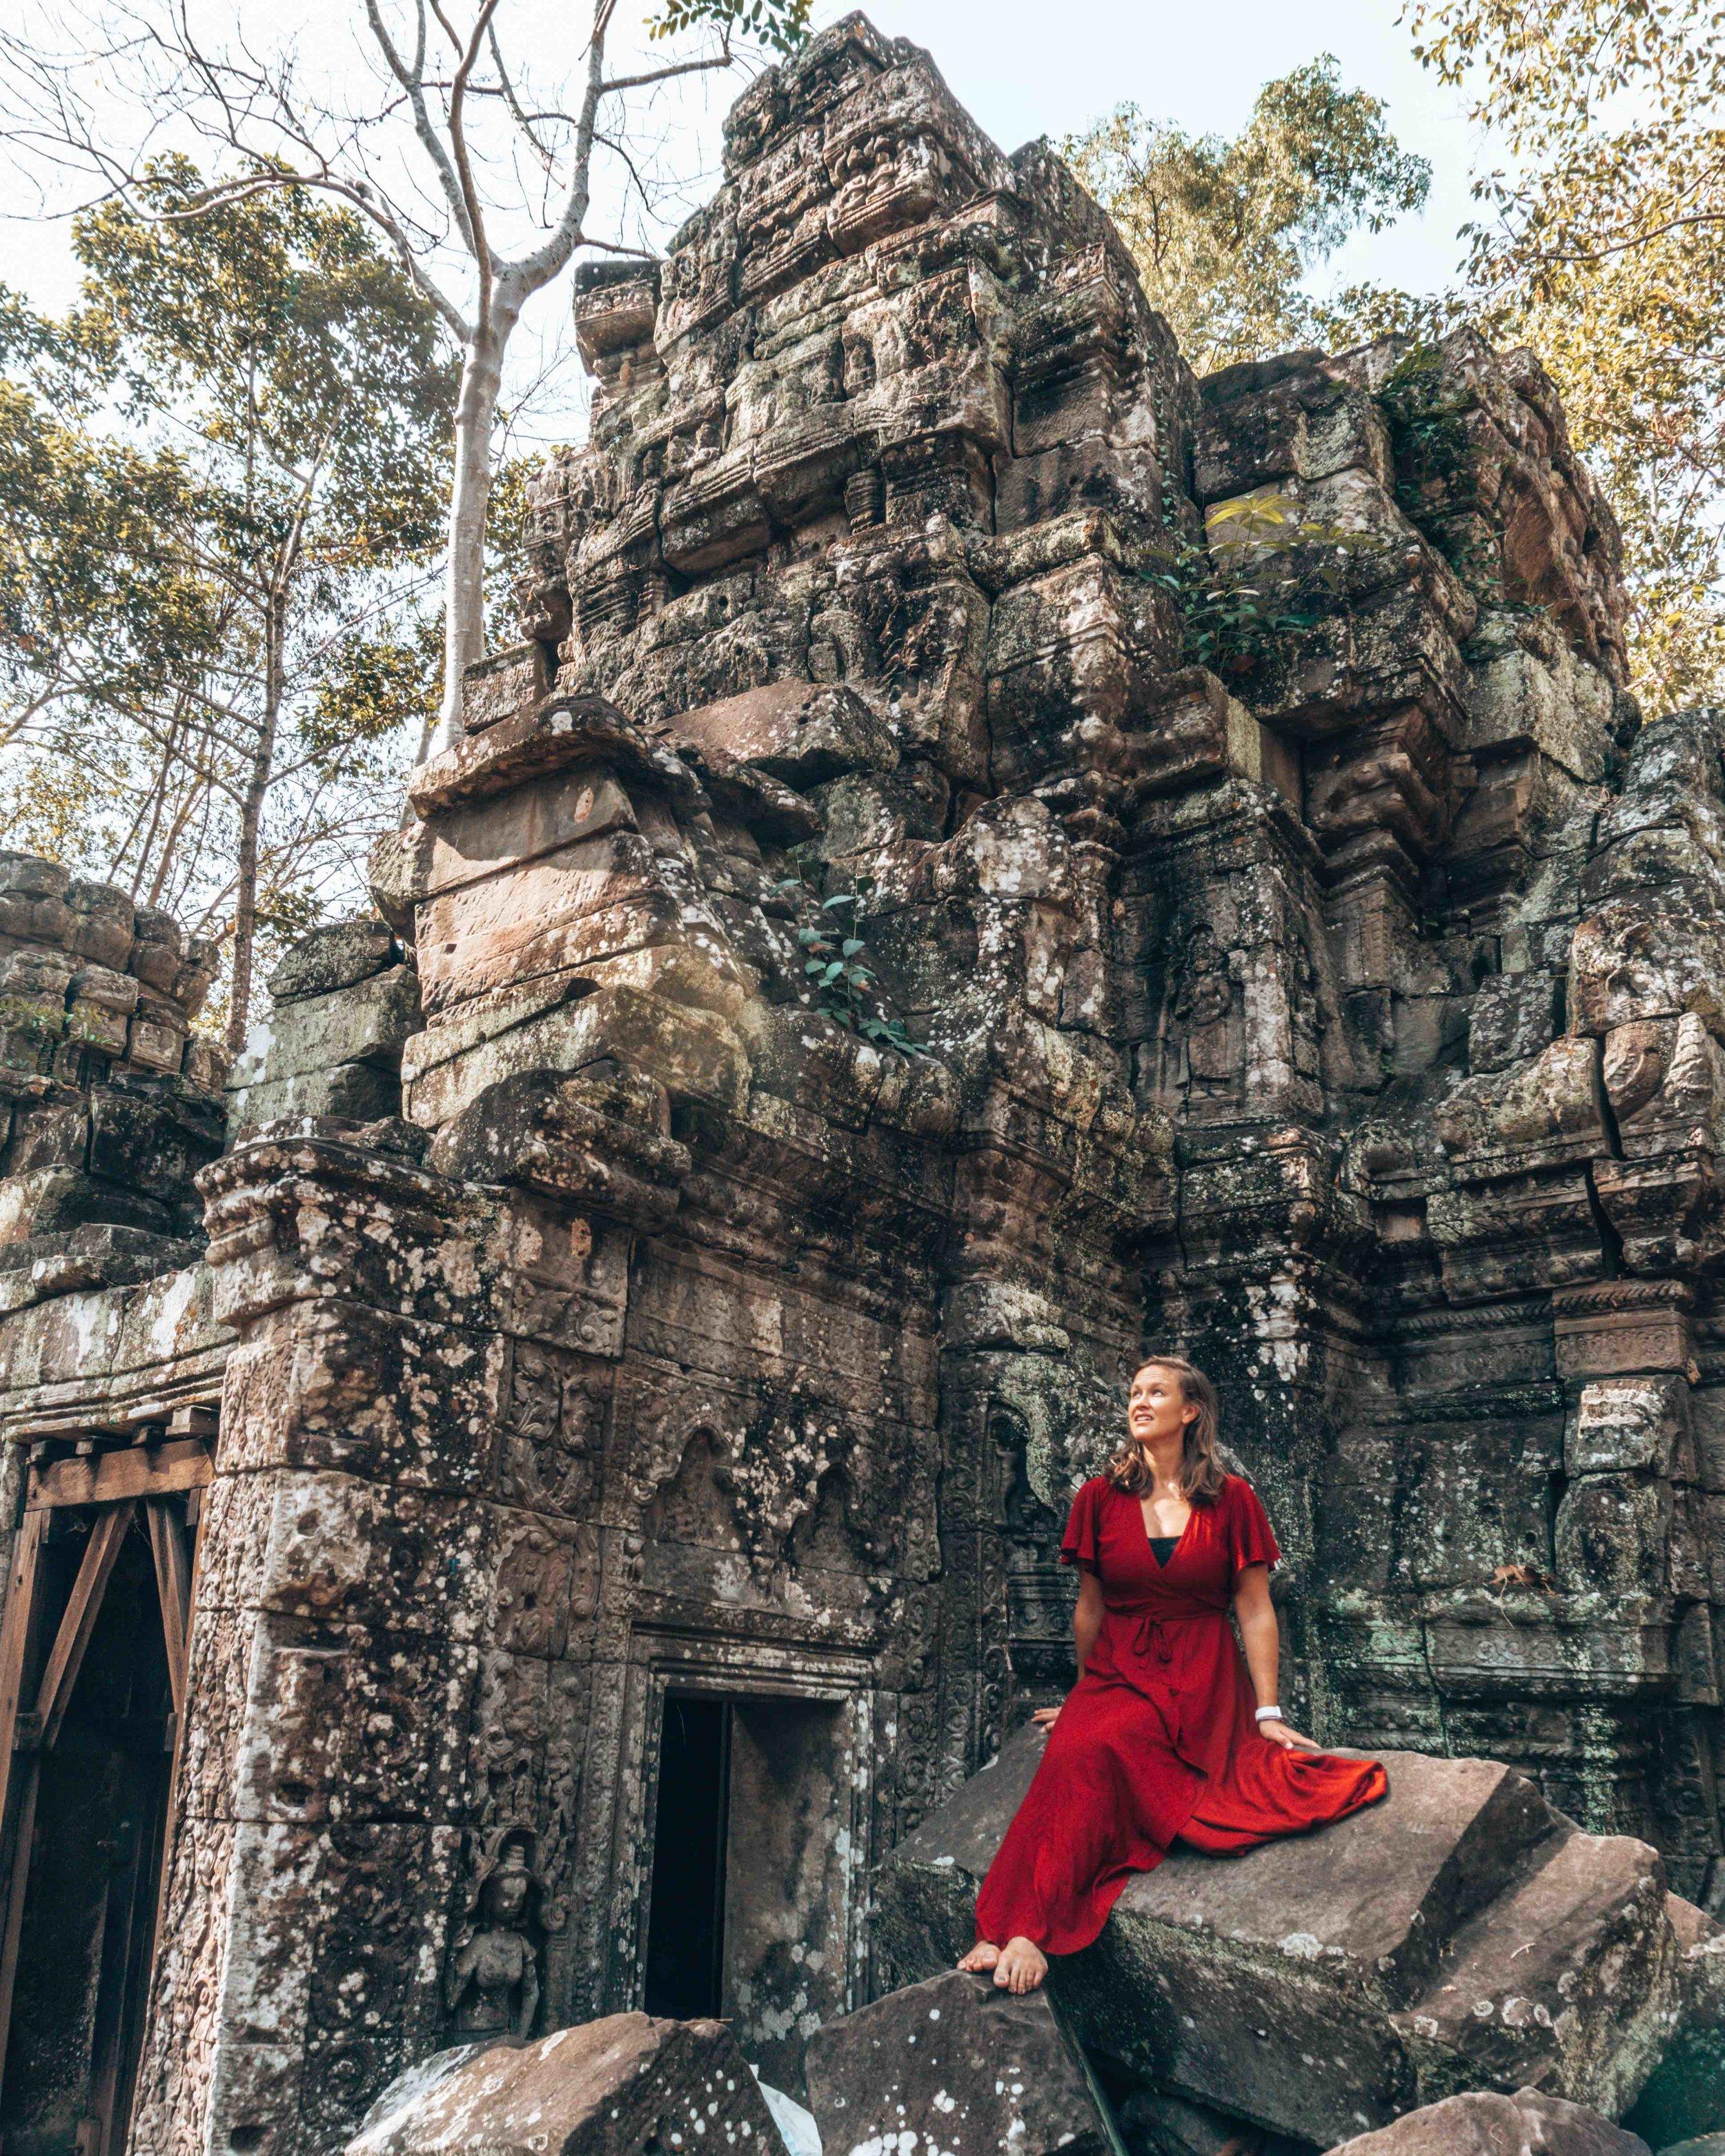 Cambodia_Siem Reap_Temple_girl_dress_moody.jpg